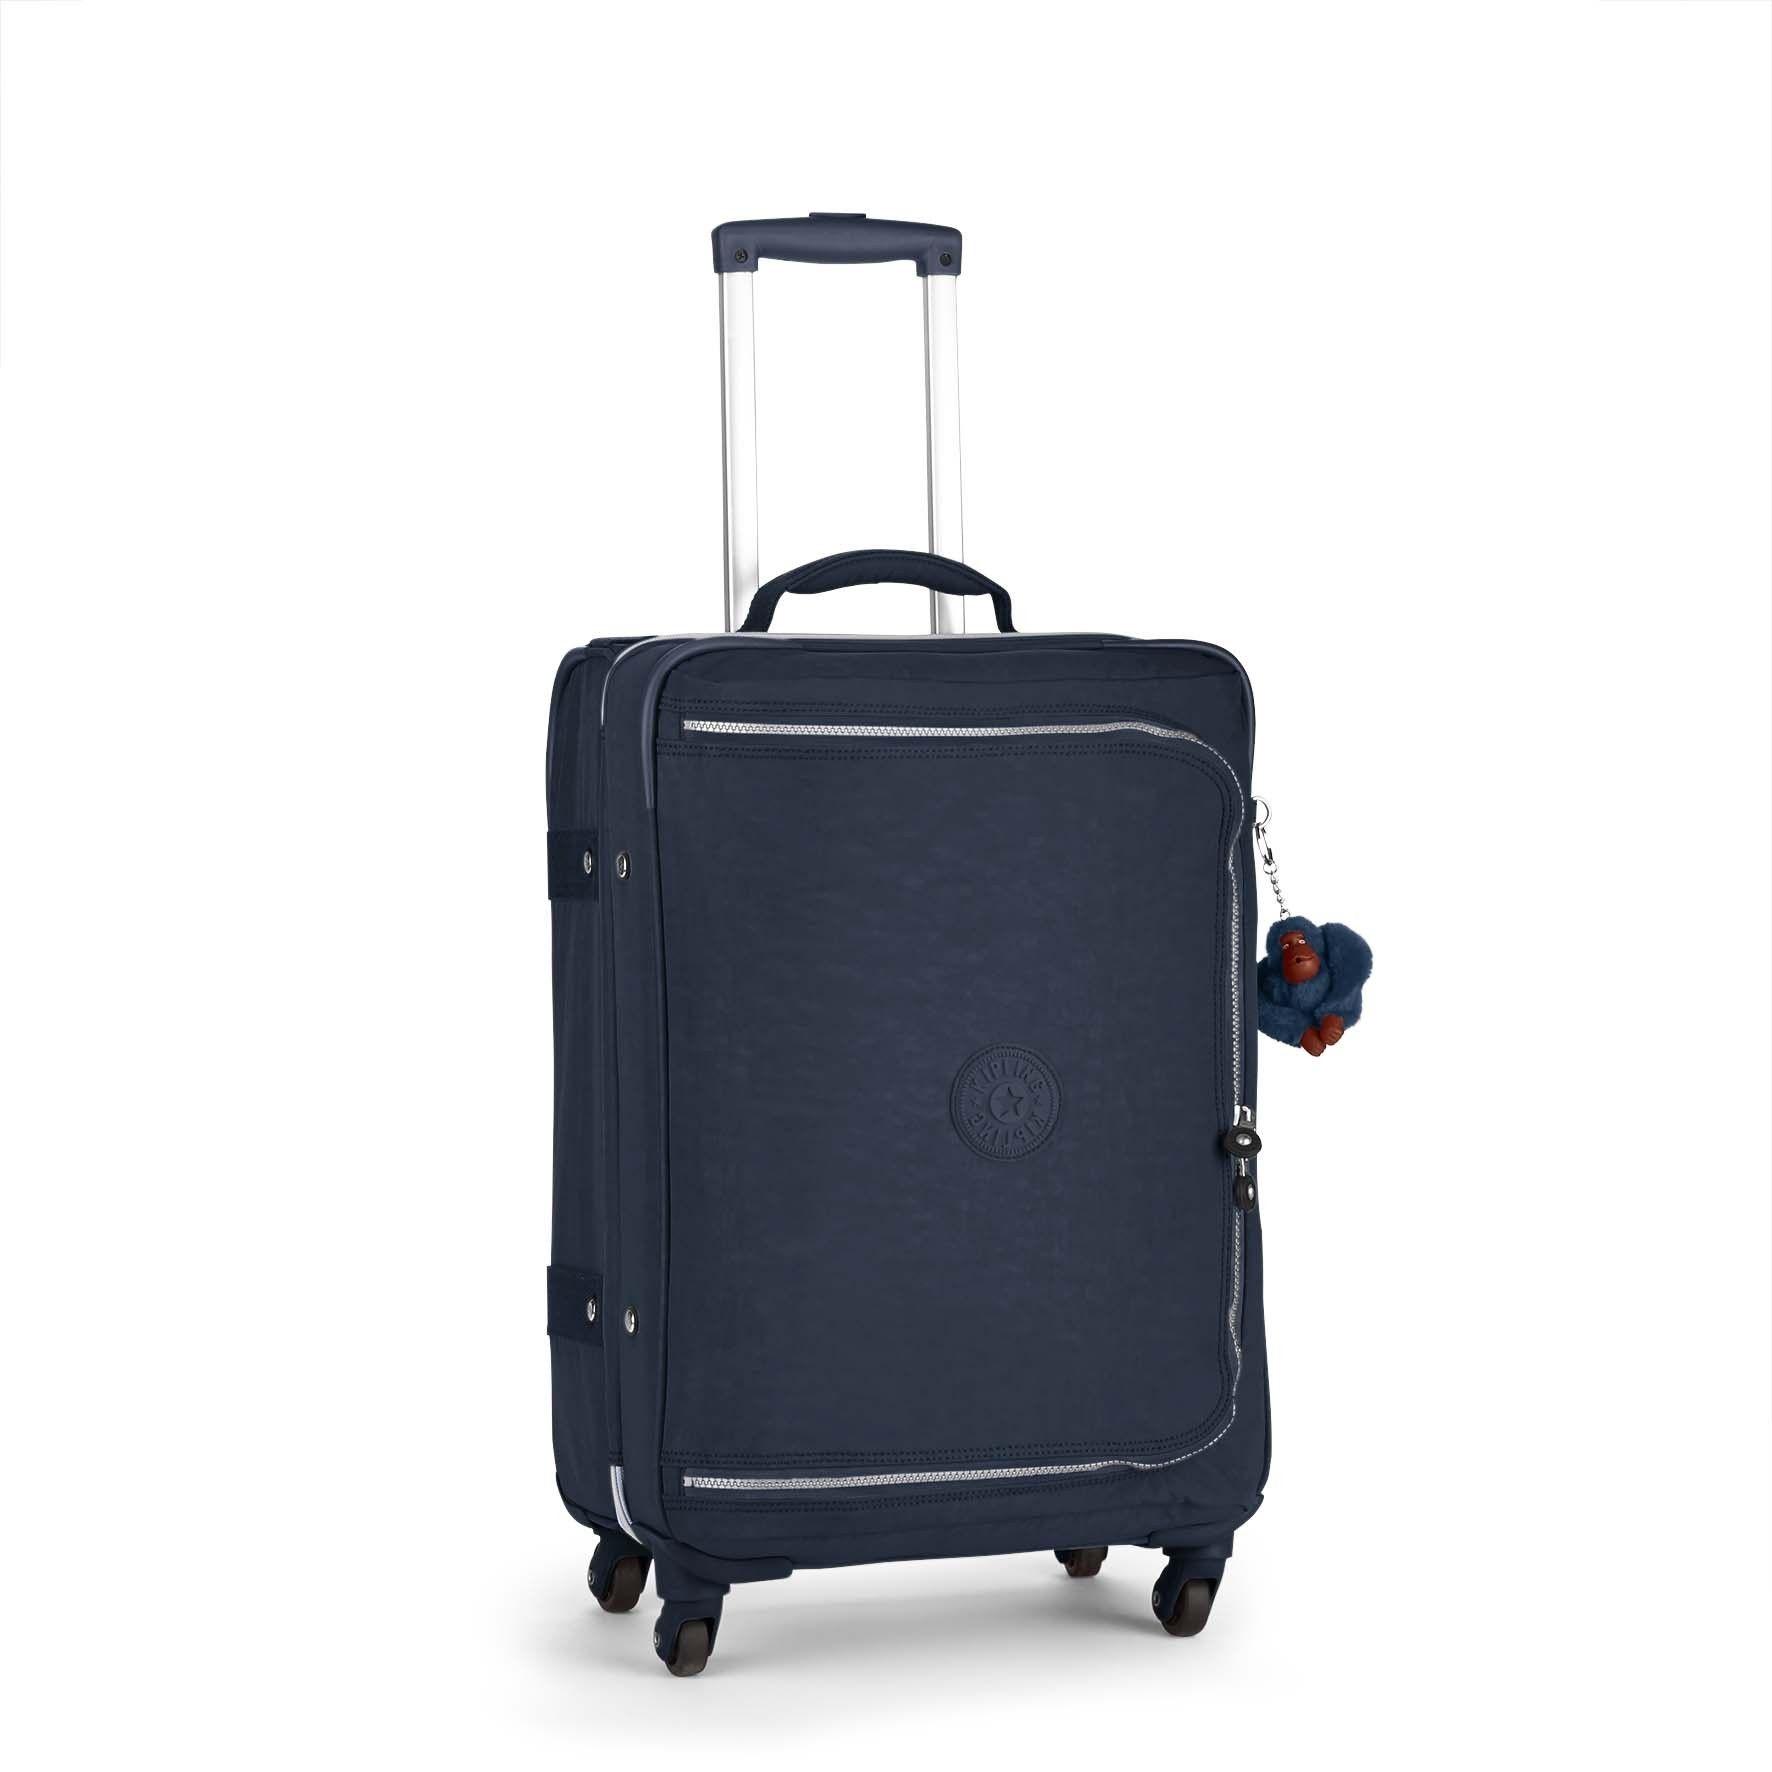 c34d3f23b Mala de bordo preta YOURI SPIN 55 Kipling | malas de viagem bolsas e  necessidades chic | Backpack bags, Luggage bags e Suitcase